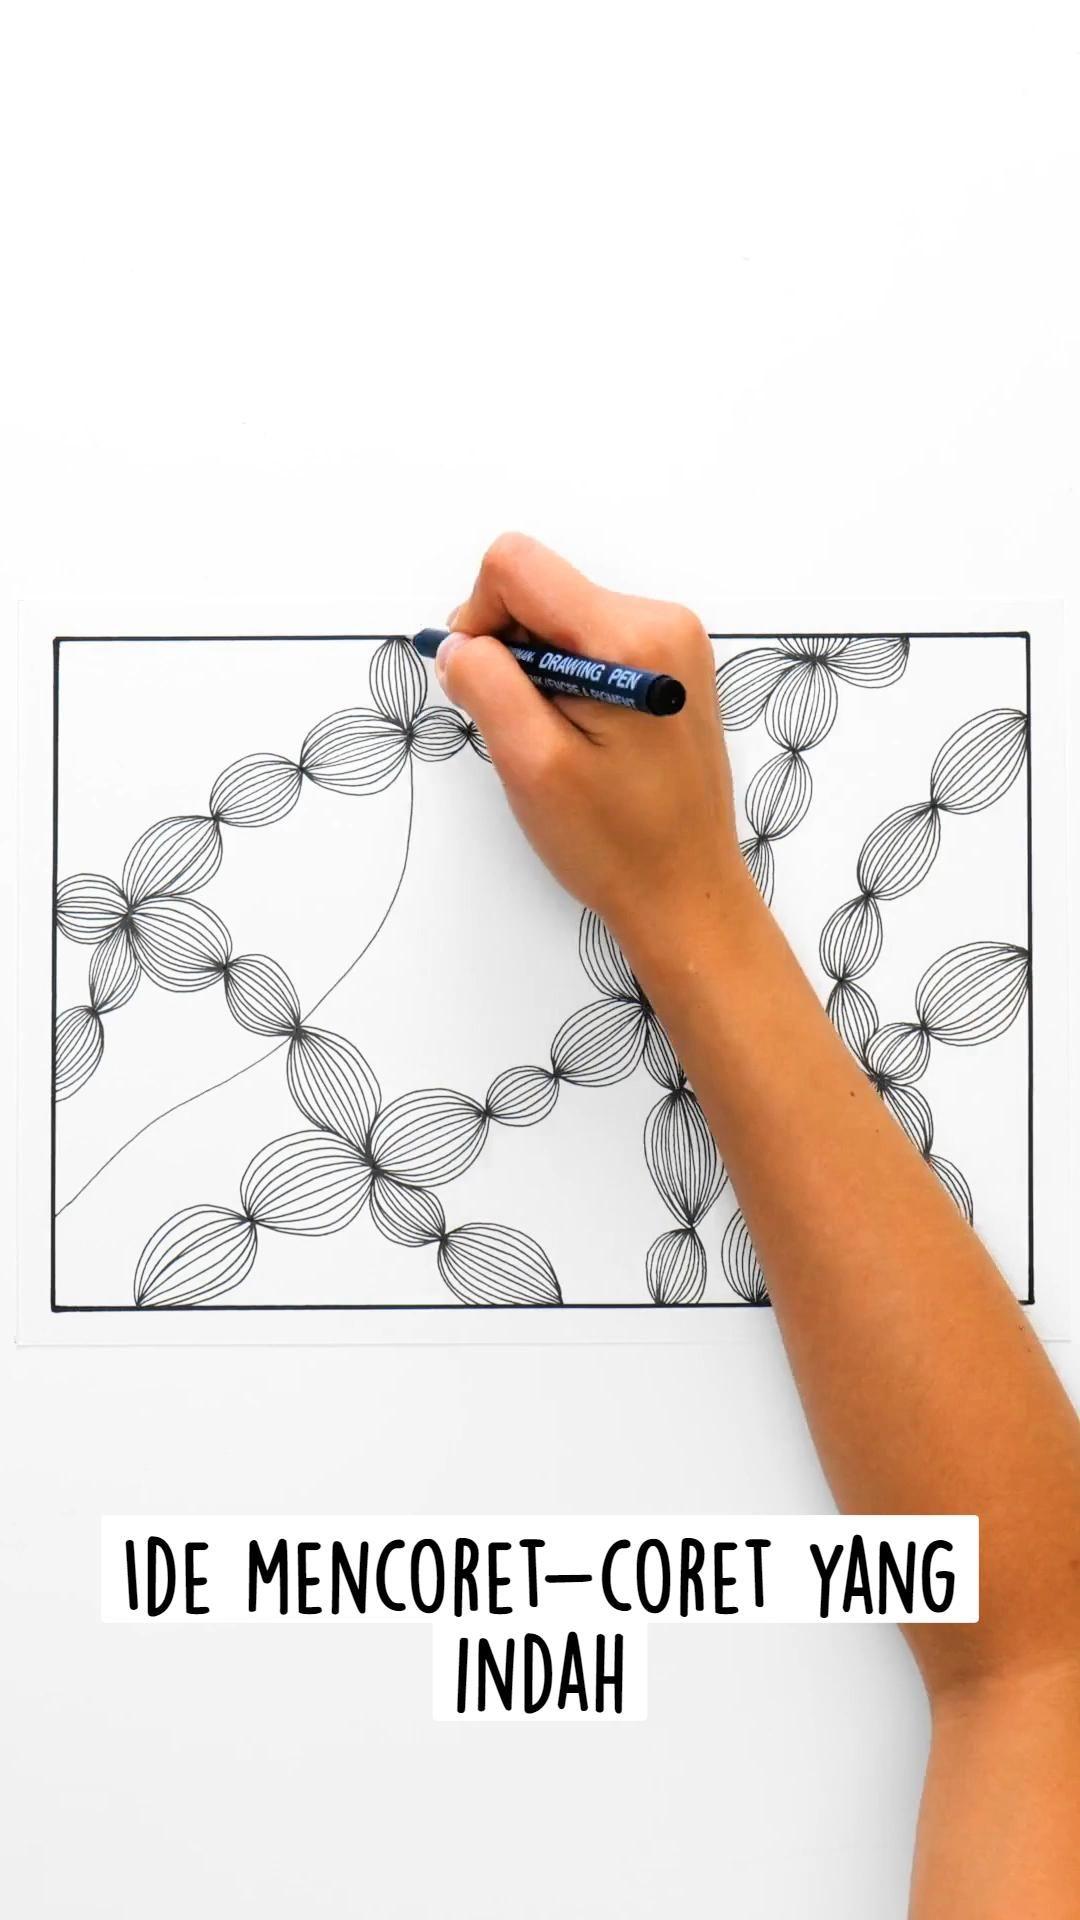 Ide Mencoret Coret Yang Indah Panduan Mendalam Oleh Kerajinan 5 Menit